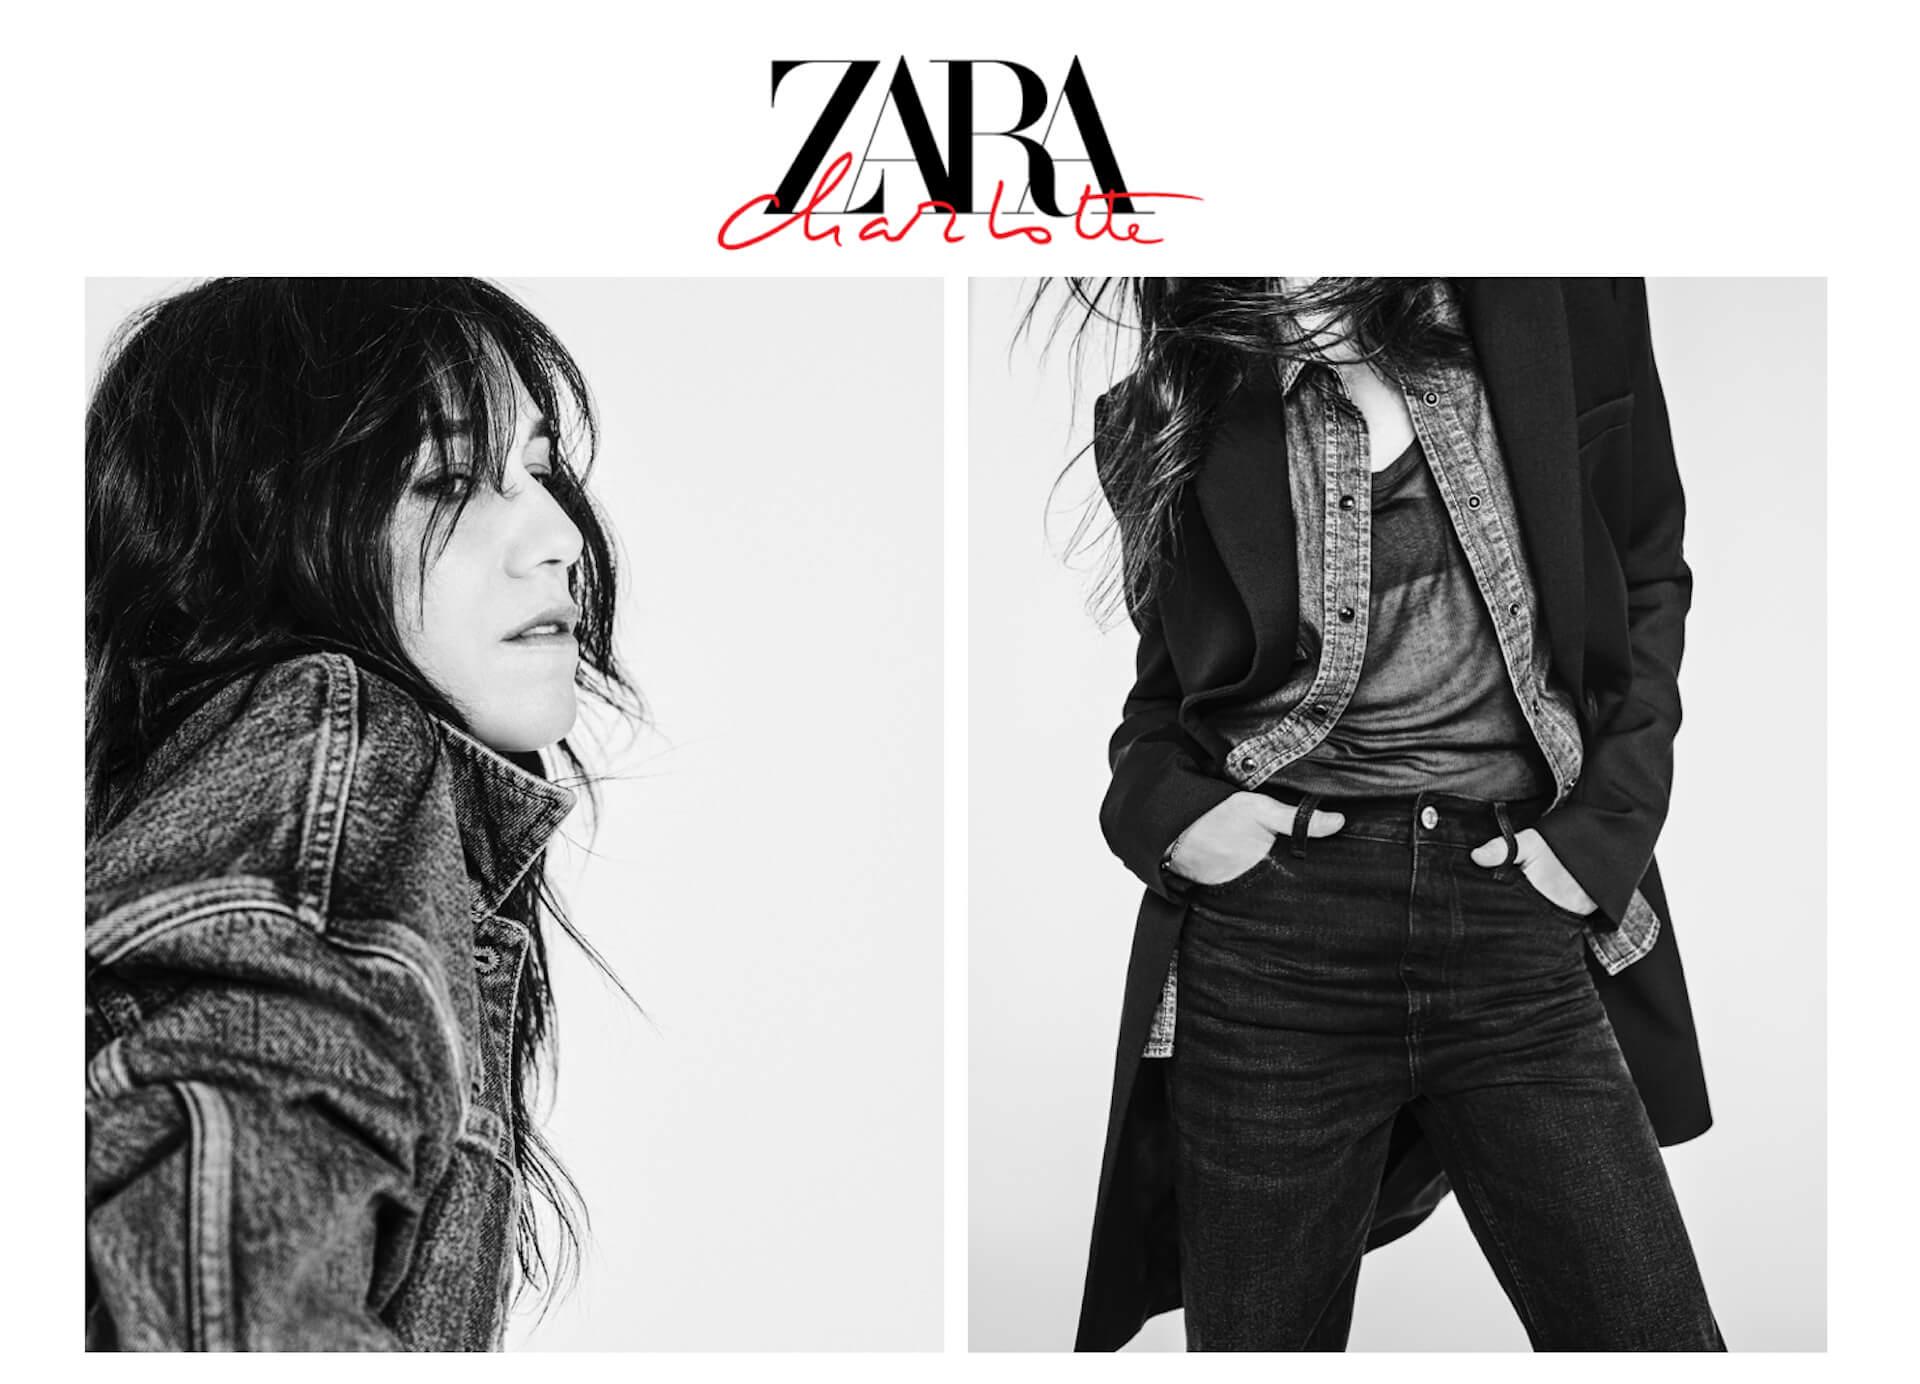 ZARAとシャルロット・ゲンズブールによるエクスクルーシブコレクションが発売決定!デニムを中心としたアイテムがラインナップ life211004_zara_charlotte_gainsbour_02